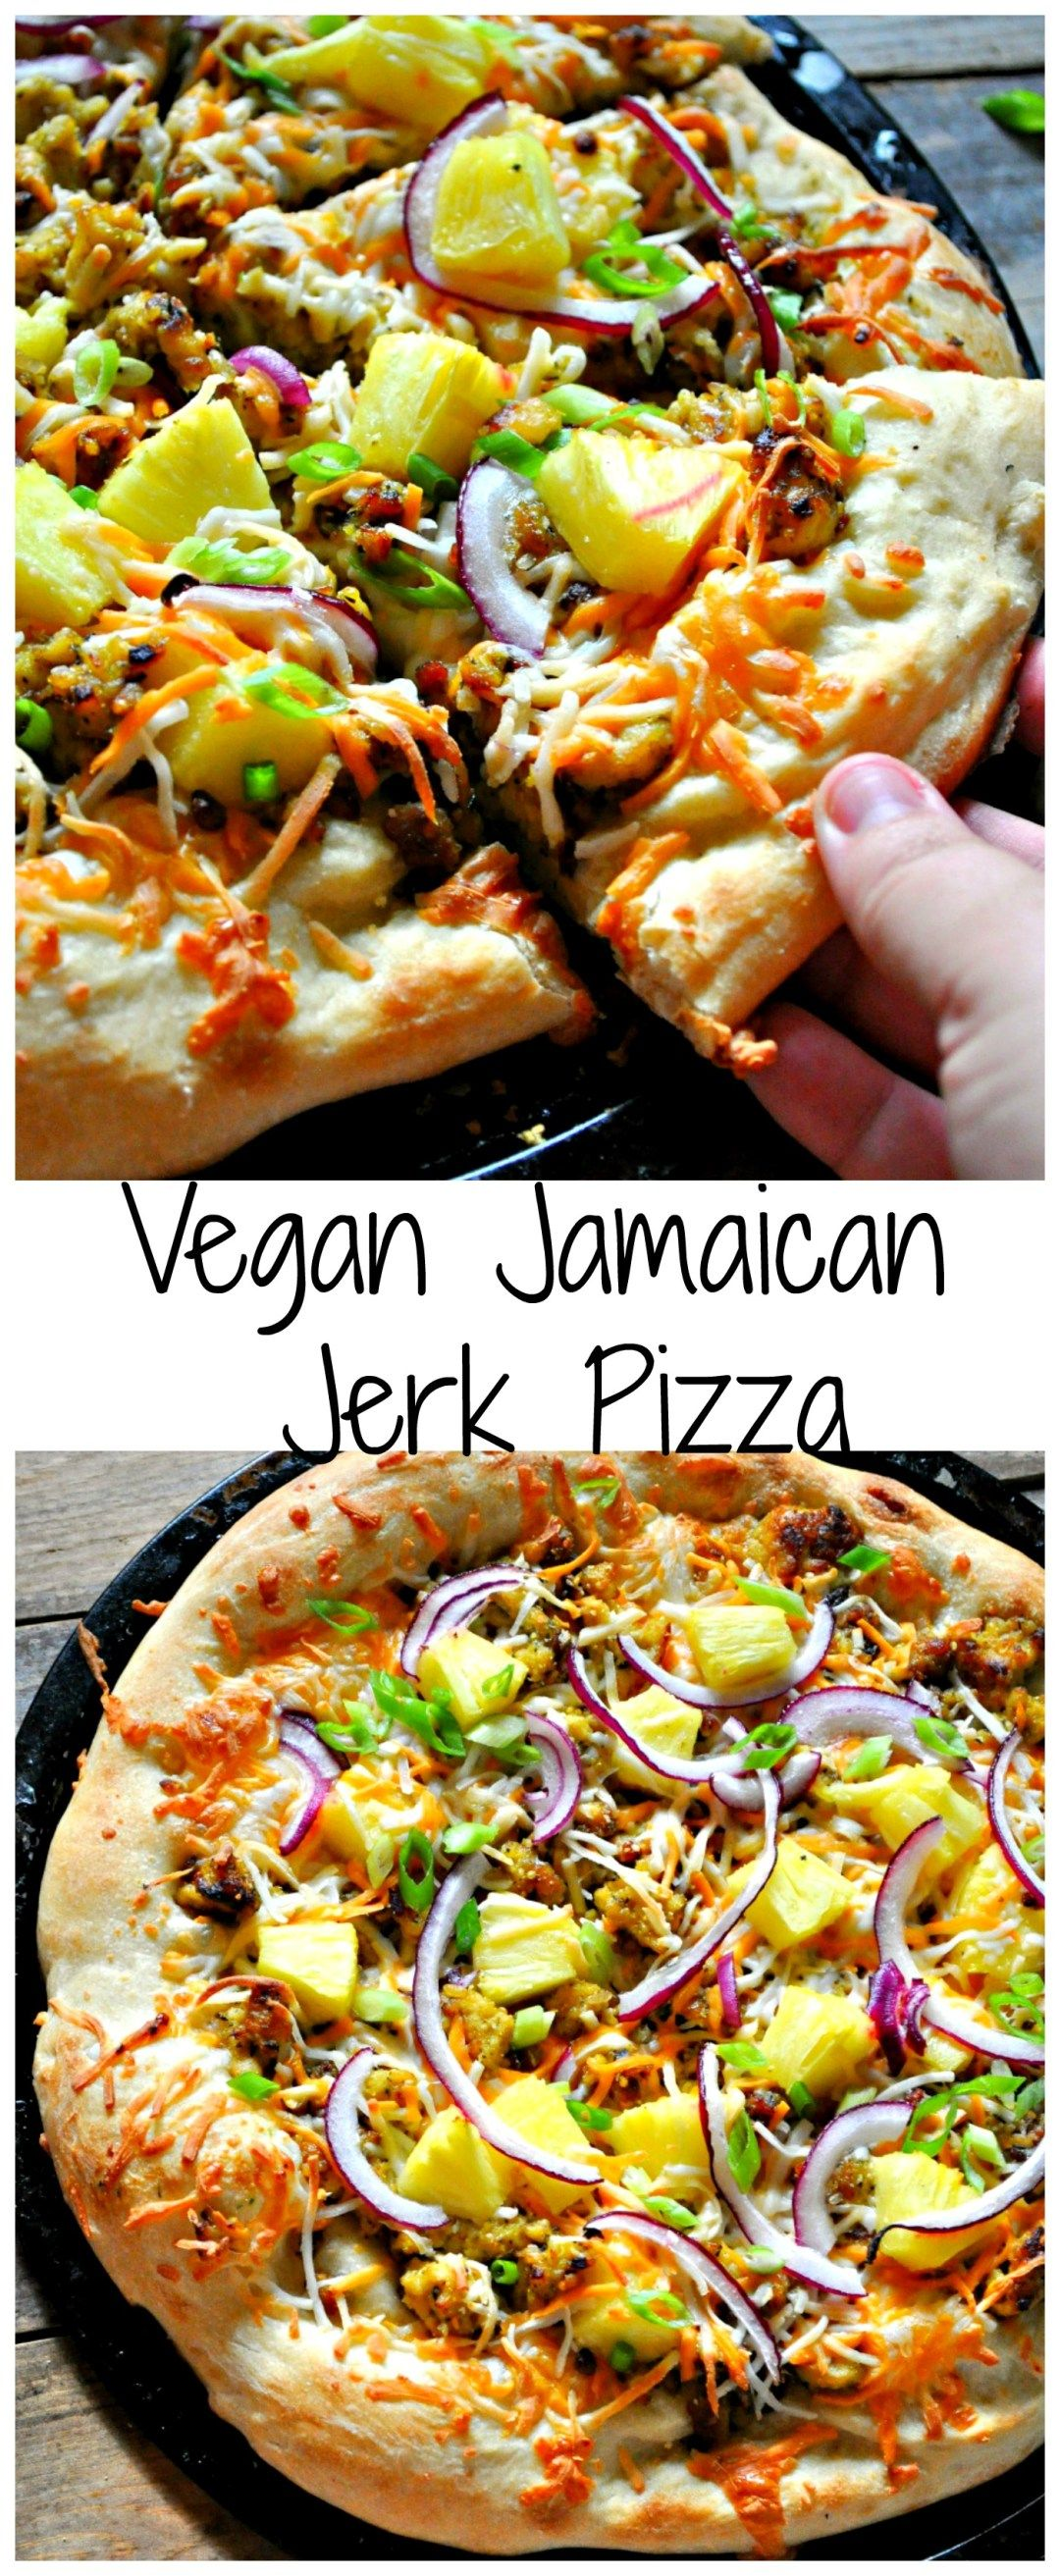 Vegan Jamaican Jerk Pizza